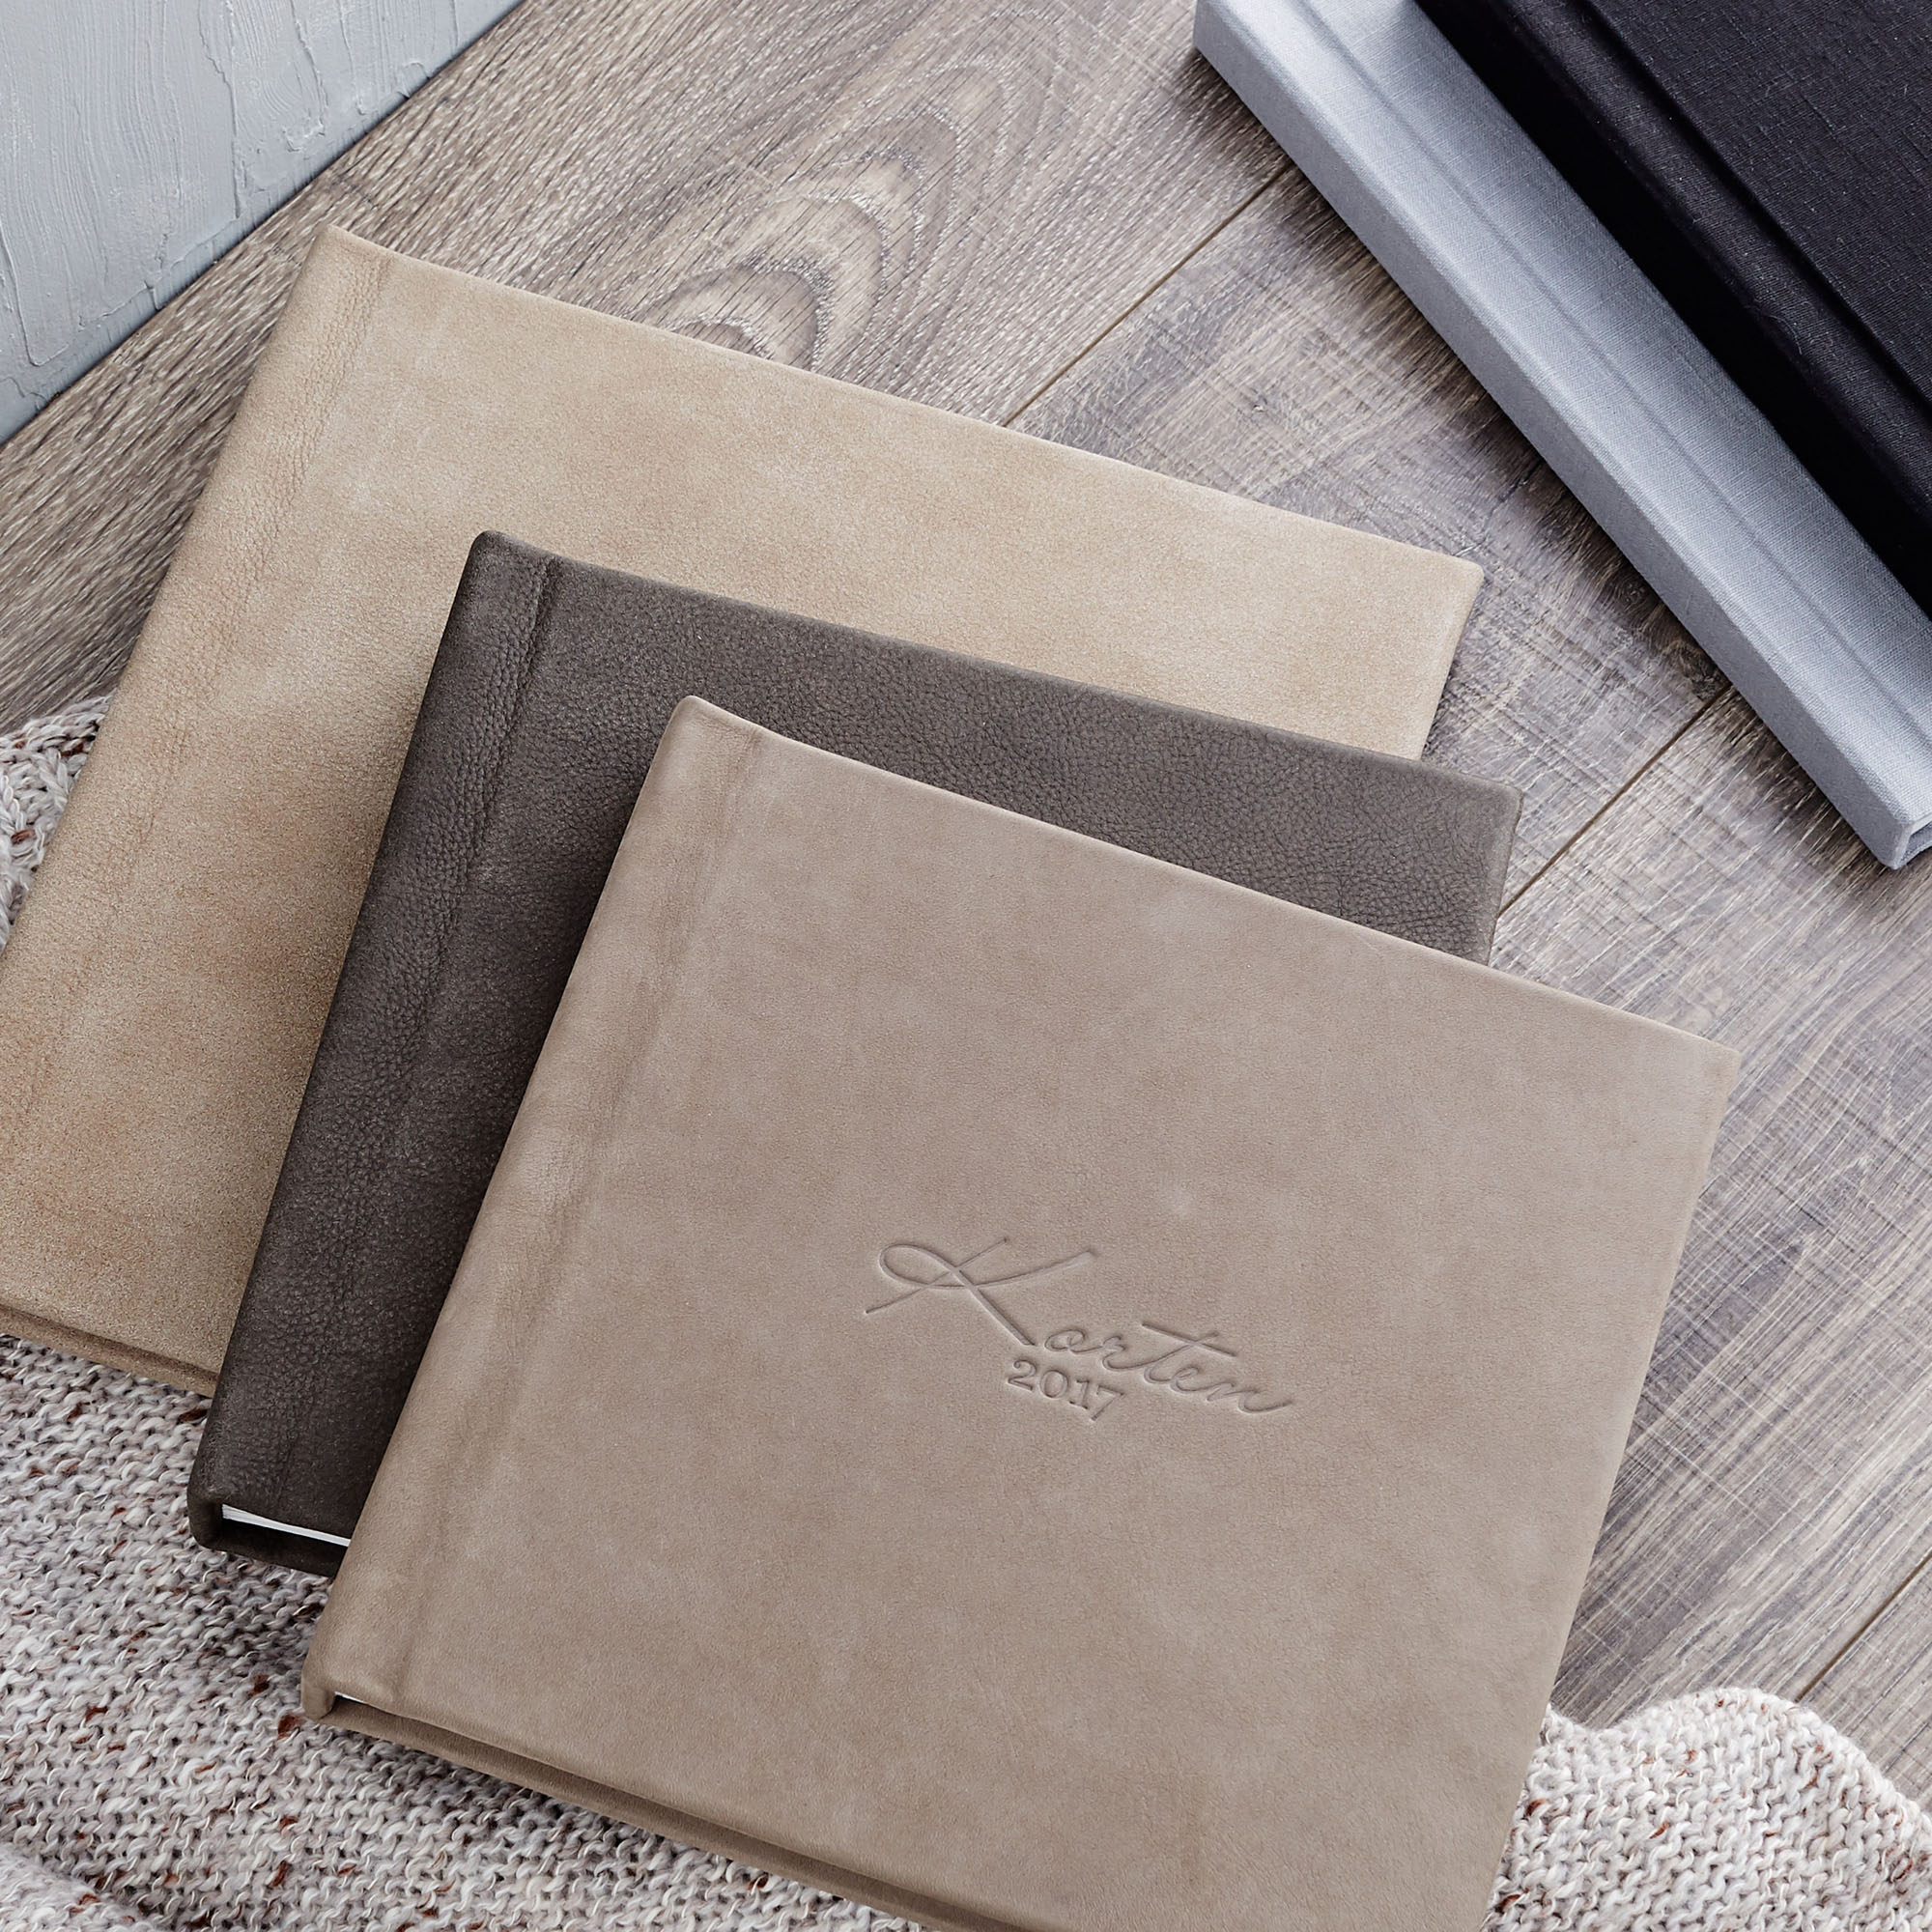 REDTREE ALBUMS & EXTRAS - 12x12 leather album: $1,50010x10 leather album: $1,2508x8 leather album: $95010x10 linen hardcover book: $75010x10 softcover book: $500bamboo presentation box: $150walnut presentation box: $300